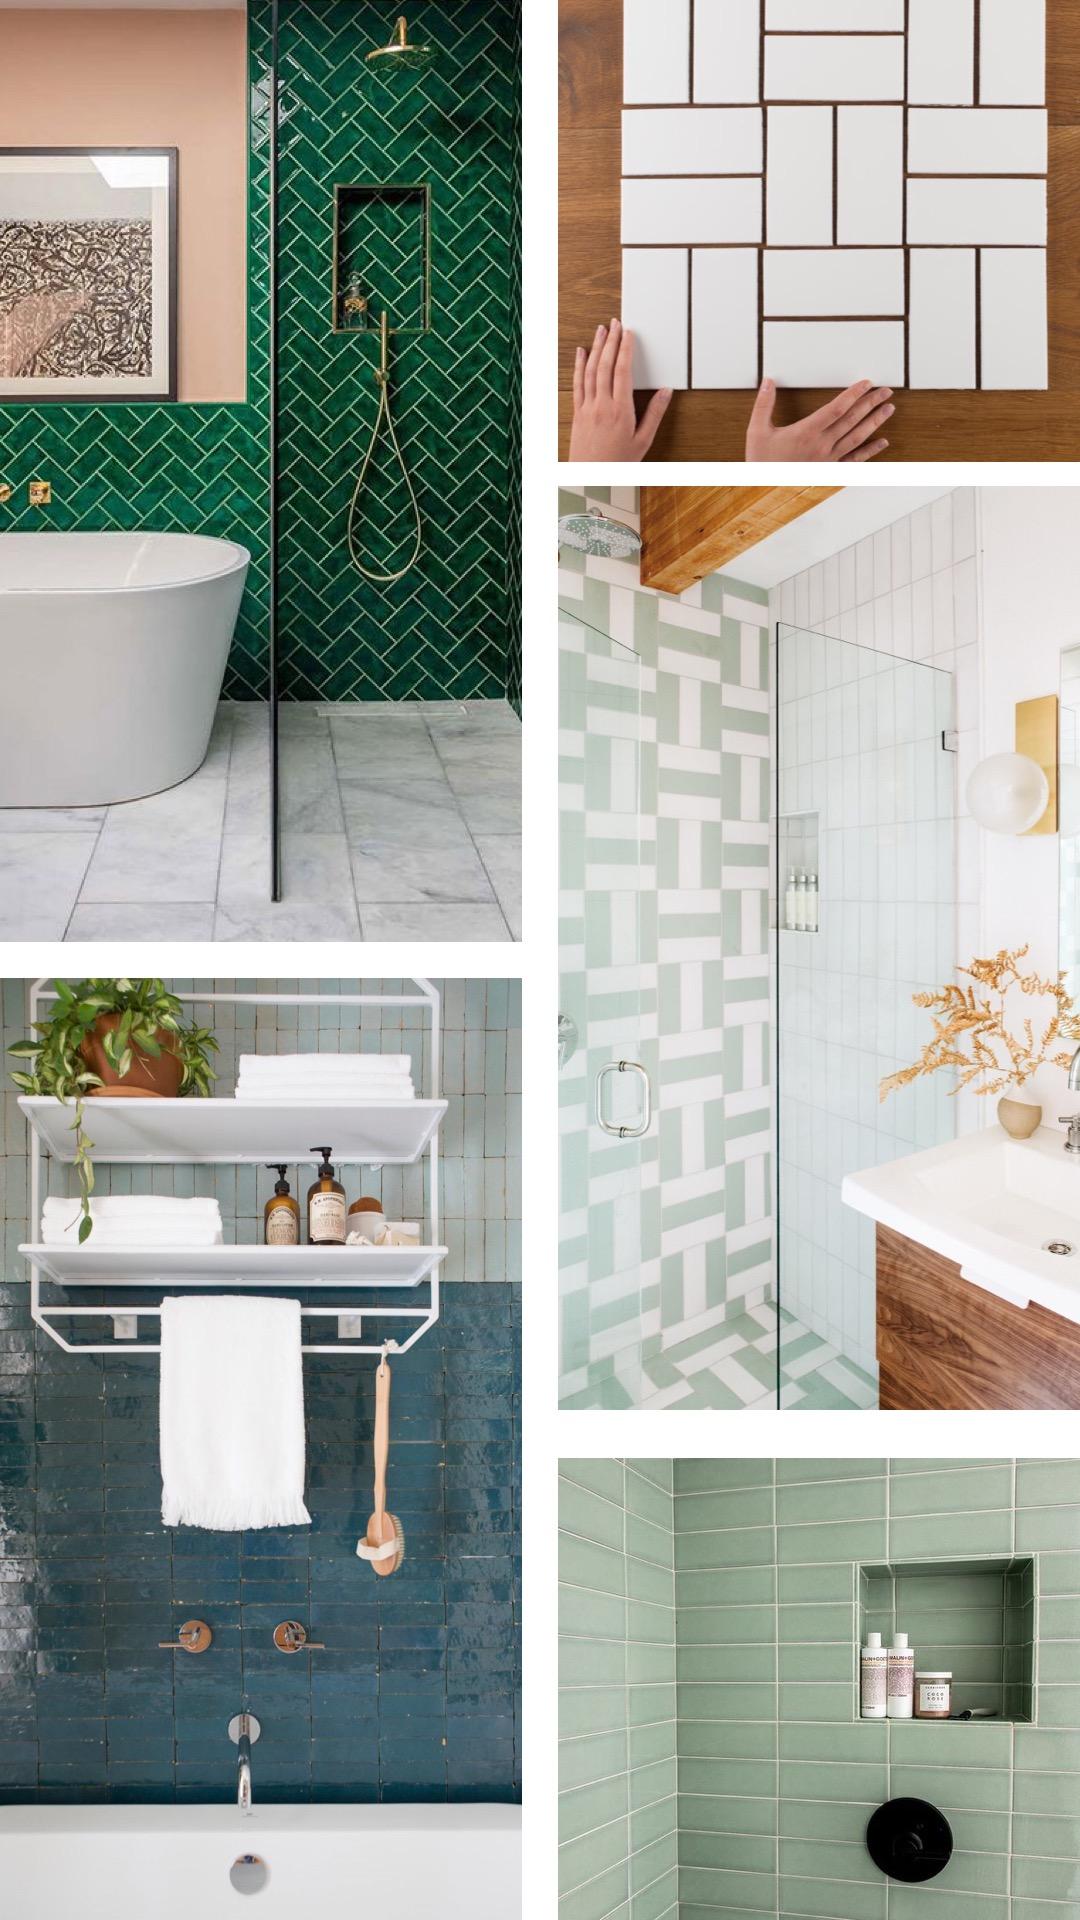 Innovative Ways To Use The Same Ol Tile Design 4 Corners